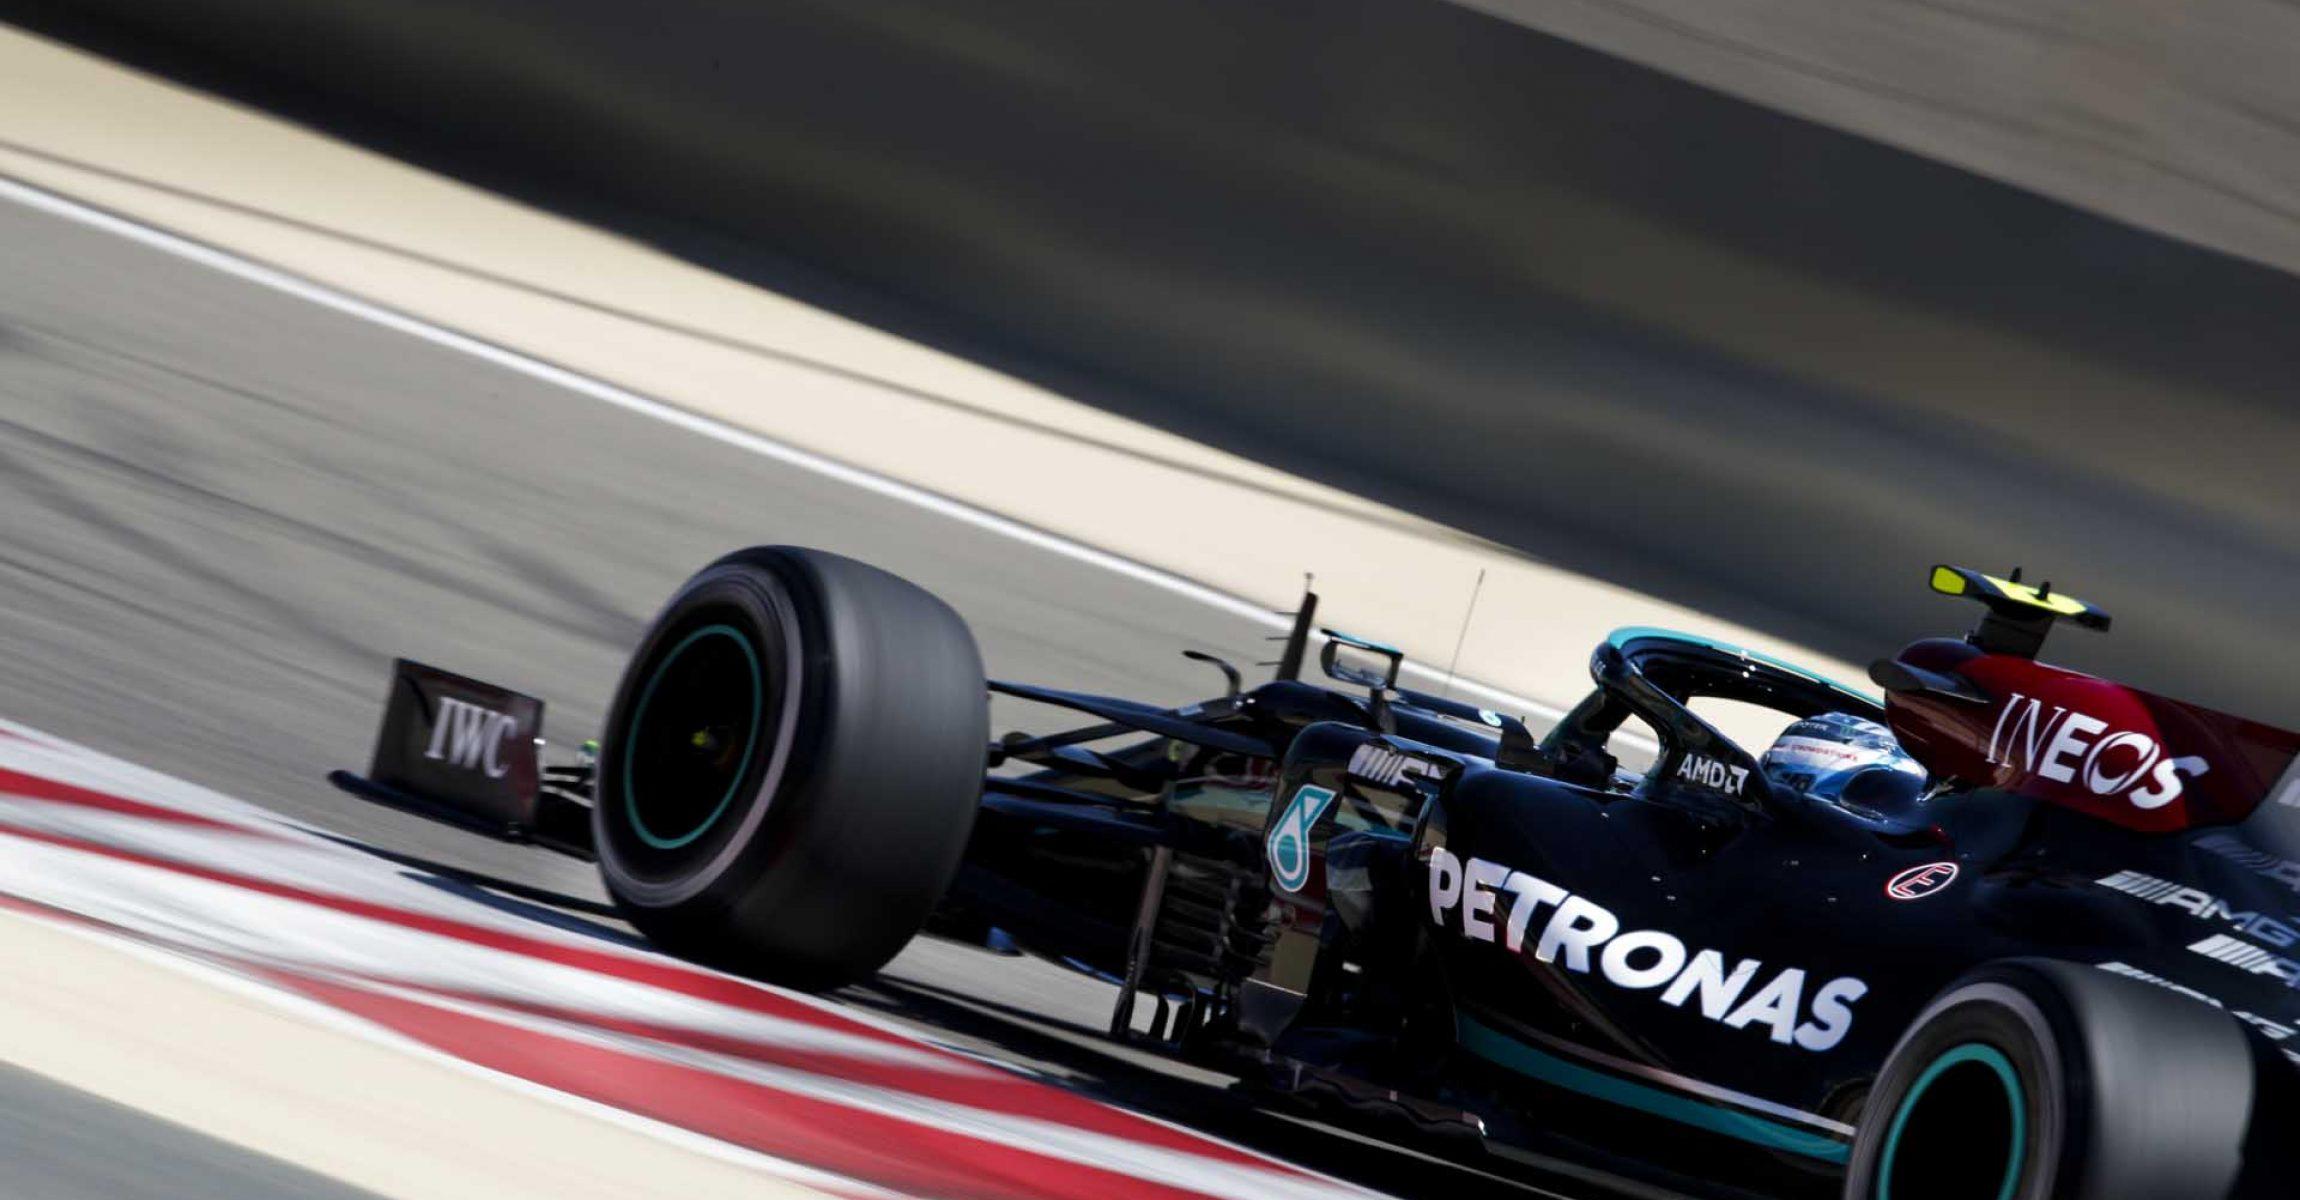 BAHRAIN INTERNATIONAL CIRCUIT, BAHRAIN - MARCH 14: Valtteri Bottas, Mercedes W12 during the Bahrain March testing at Bahrain International Circuit on Sunday March 14, 2021 in Sakhir, Bahrain. (Photo by Zak Mauger / LAT Images)